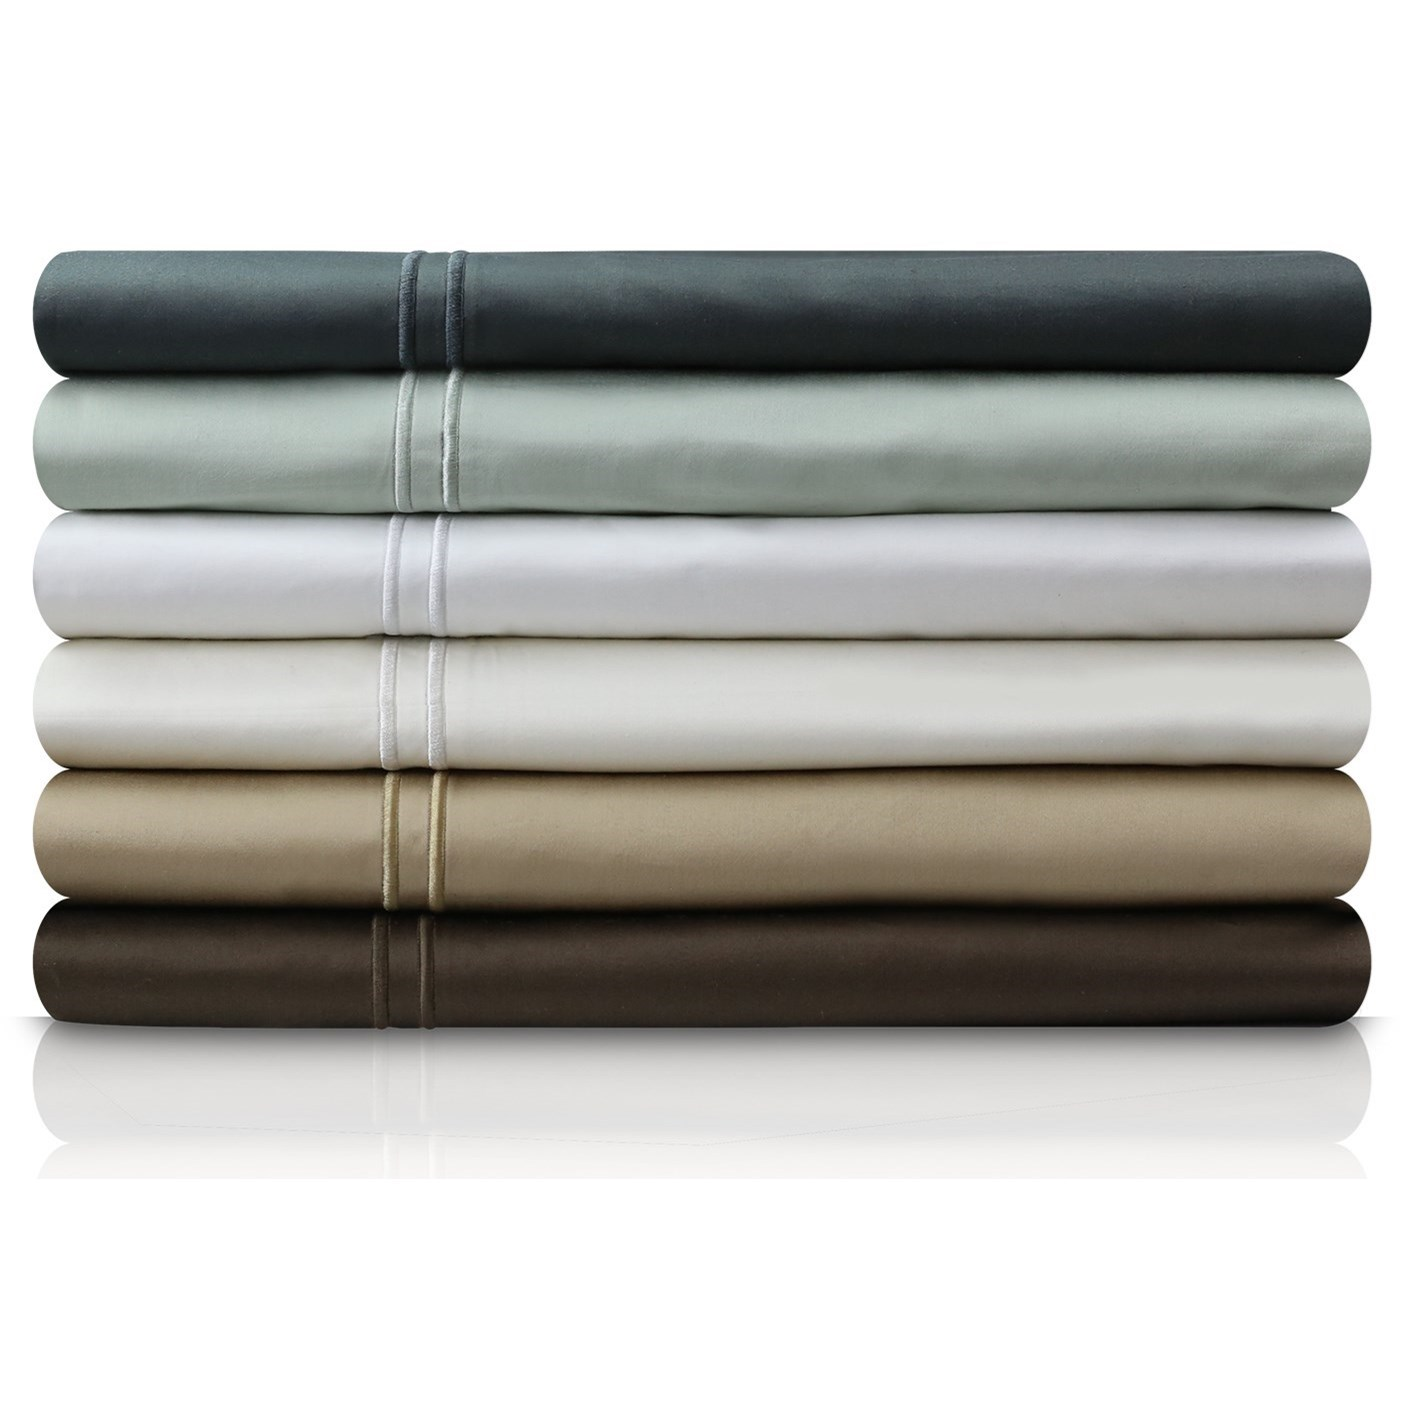 Malouf Egyptian Cotton Queen 600 TC Egyptian Cotton Pillowcases  - Item Number: MA06QQCHPC